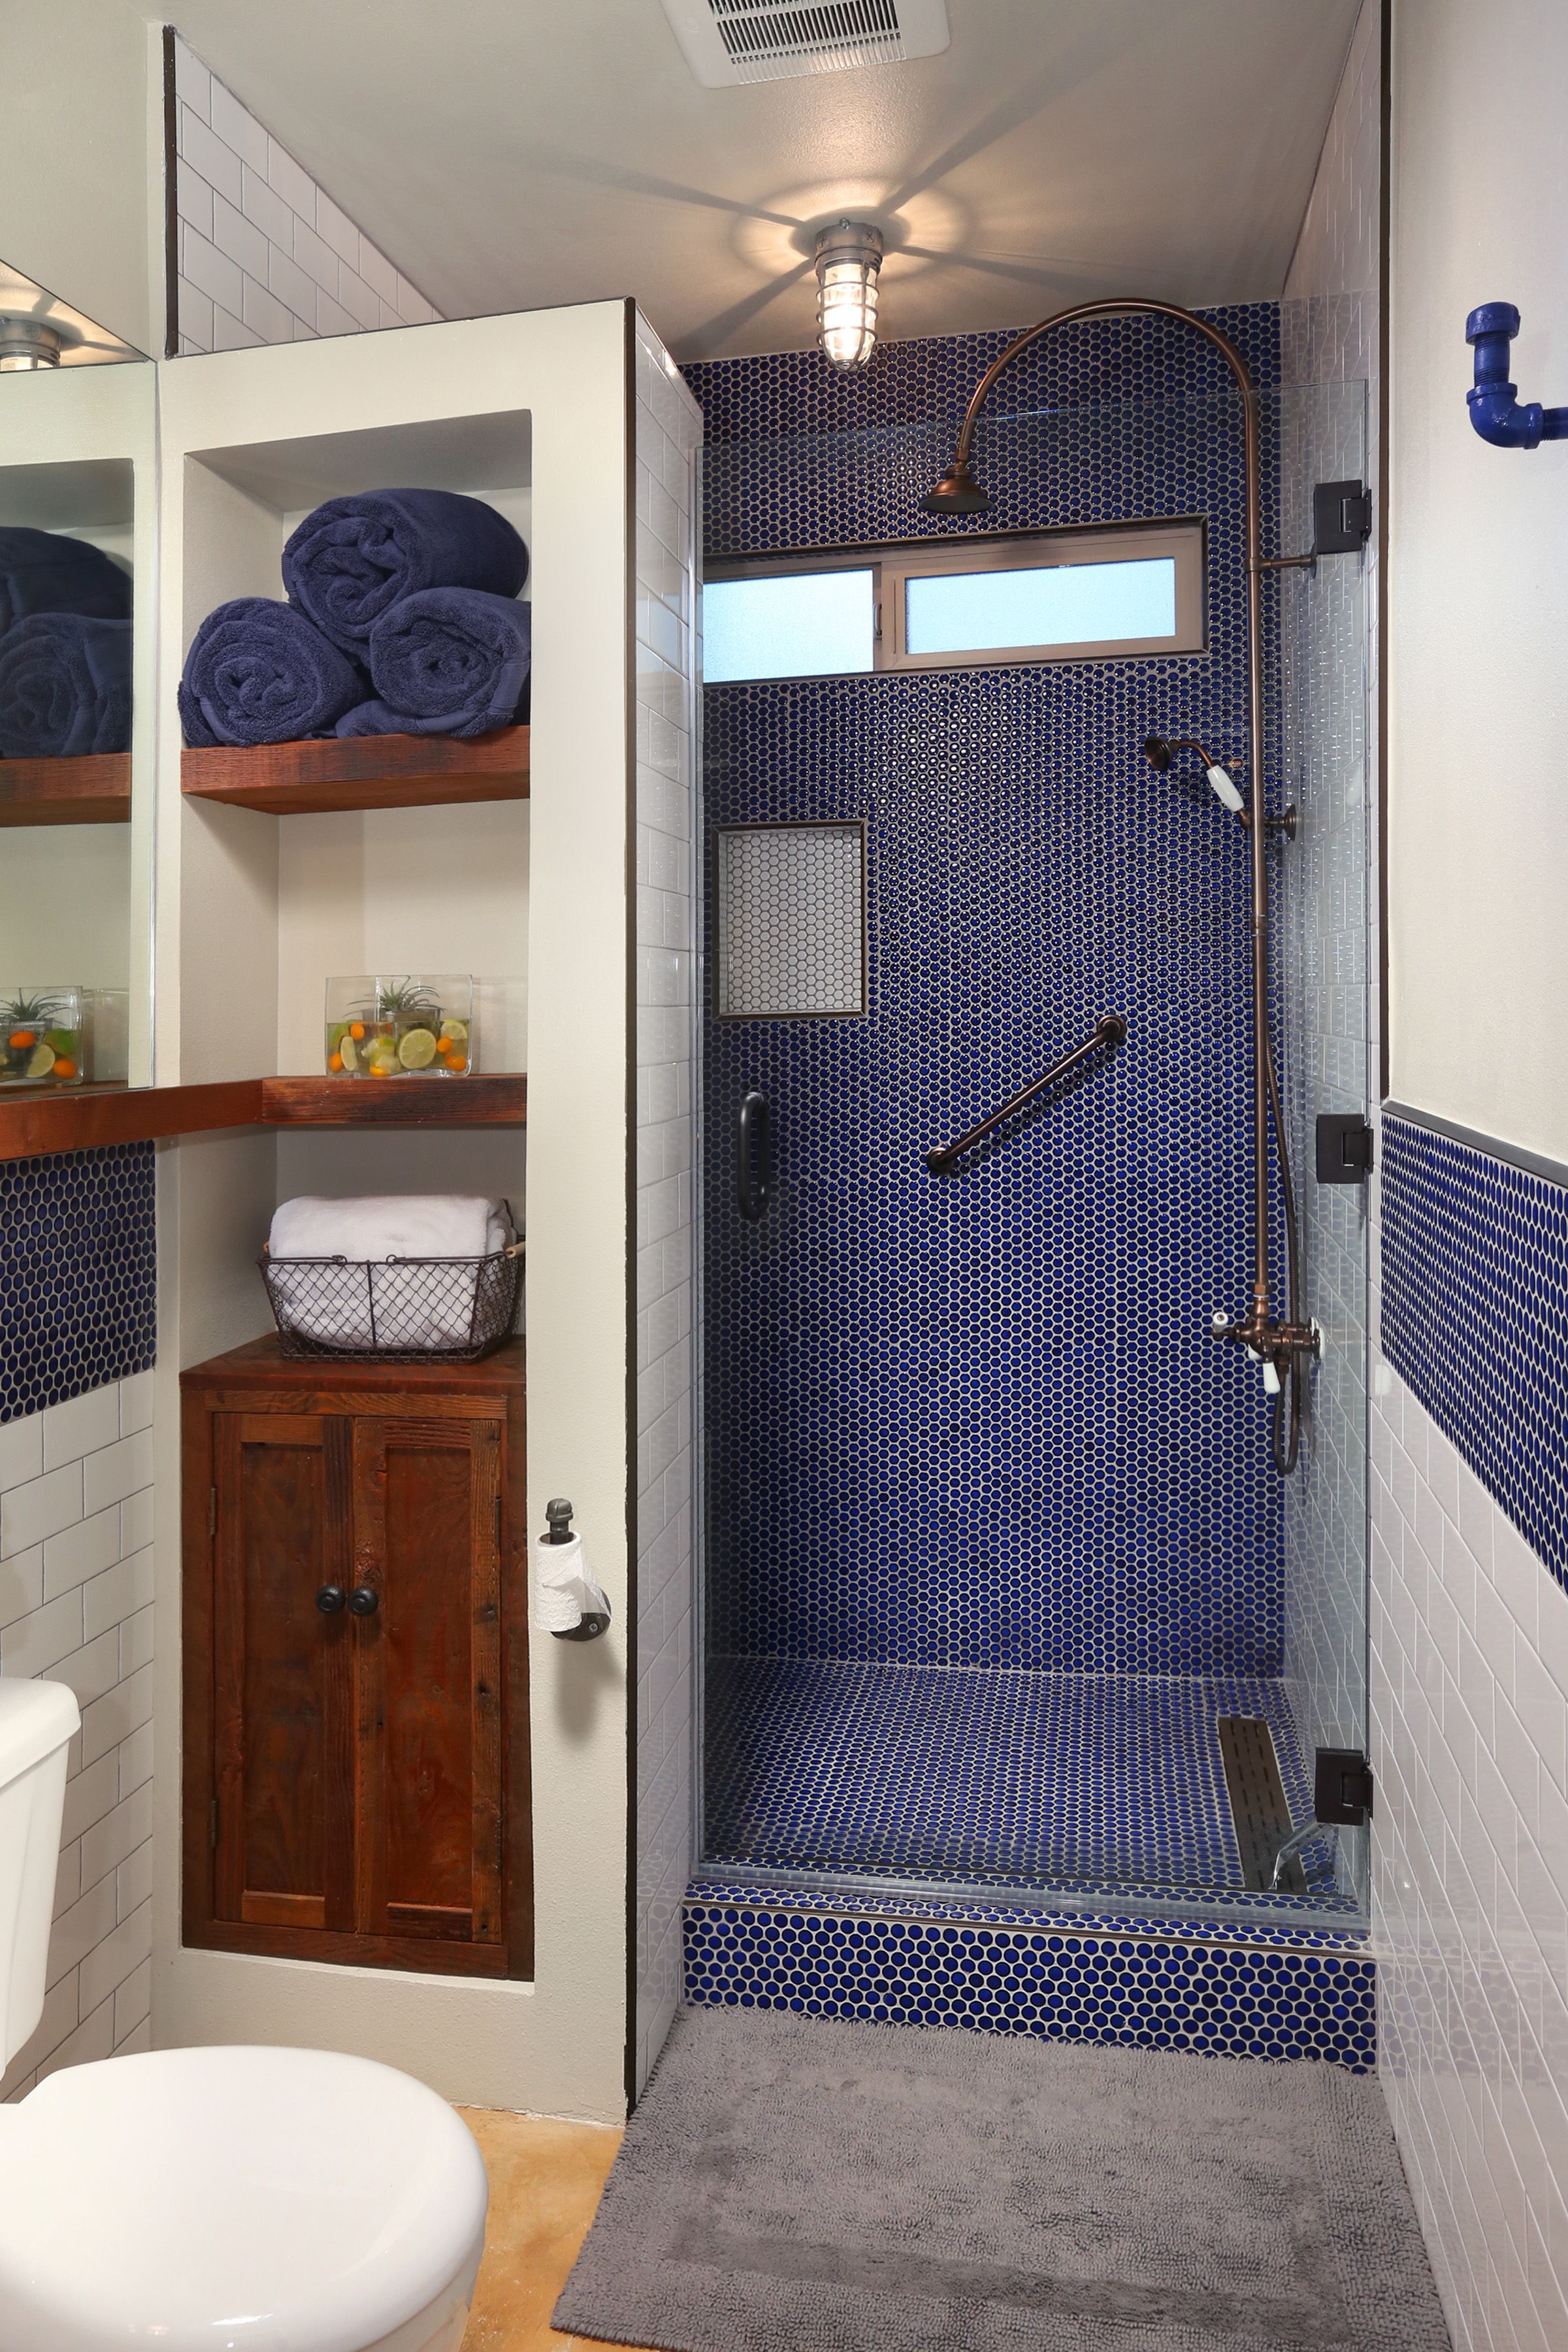 Uncategorized reclaimed subway tile purecolonsdetoxreviews home design uncategorized reclaimed subway tile industrial bathroom subway tiles white penny blue shower enclosure dailygadgetfo Images